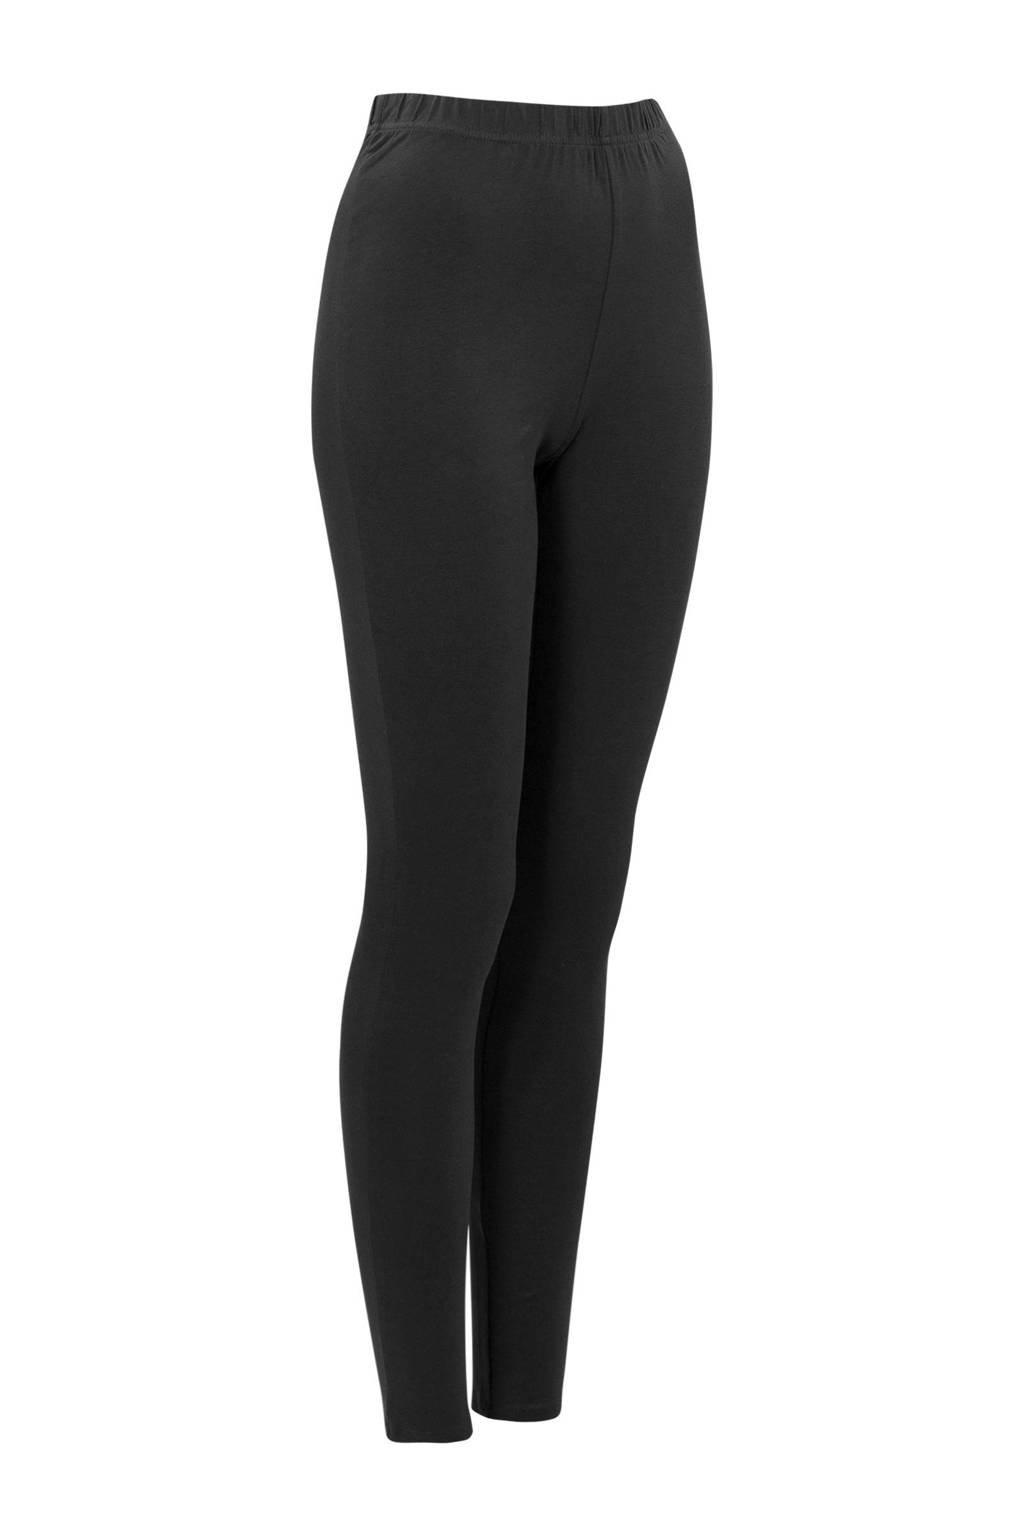 Miss Etam Lang legging  zwart, Zwart